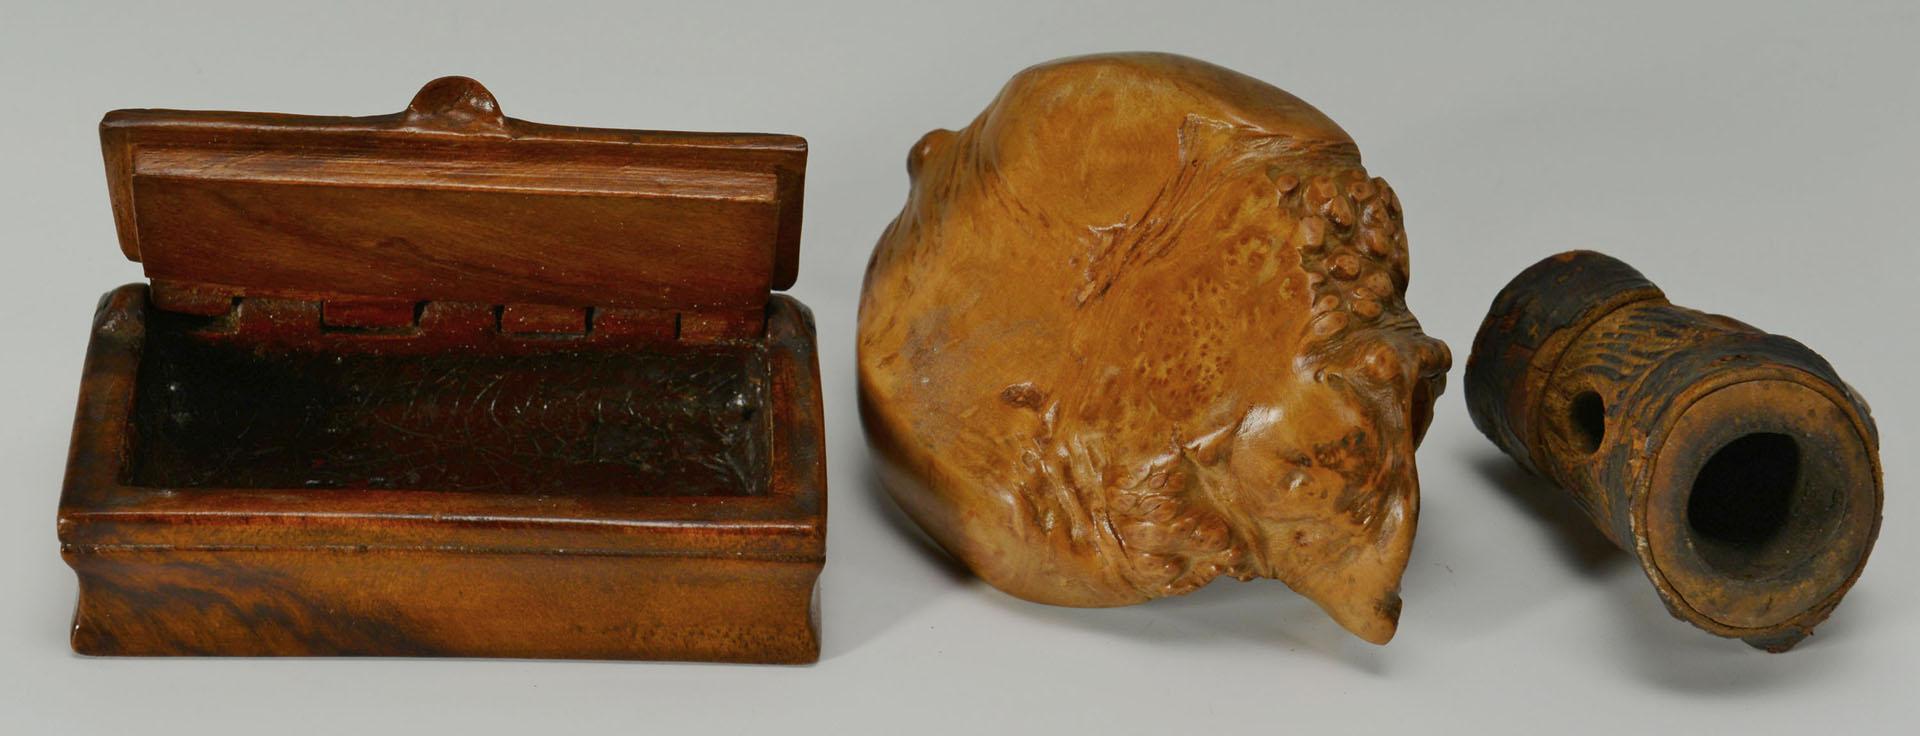 3 Folk Art Carvings and a Civil War Fife (4 items)